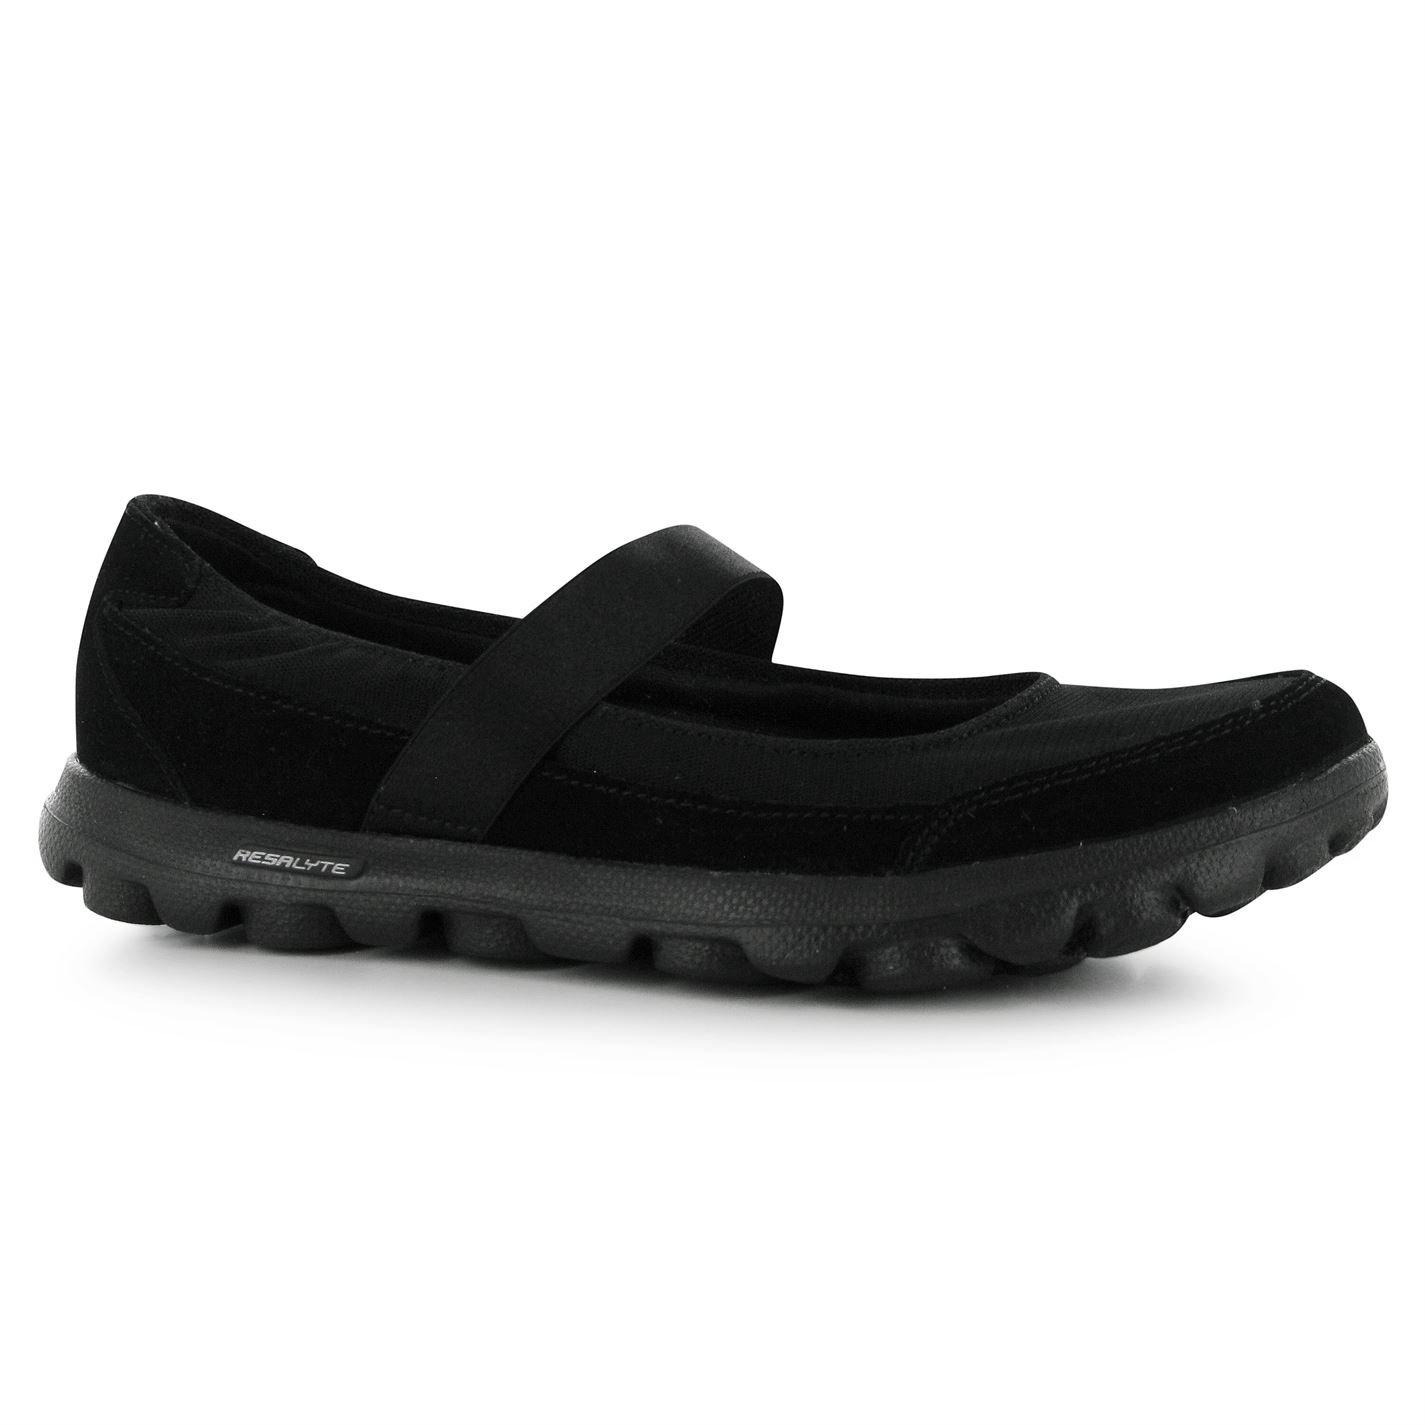 Skechers Womens Go Walk ED Nylon Slip On Mary Jane Shoes Casual Footwear